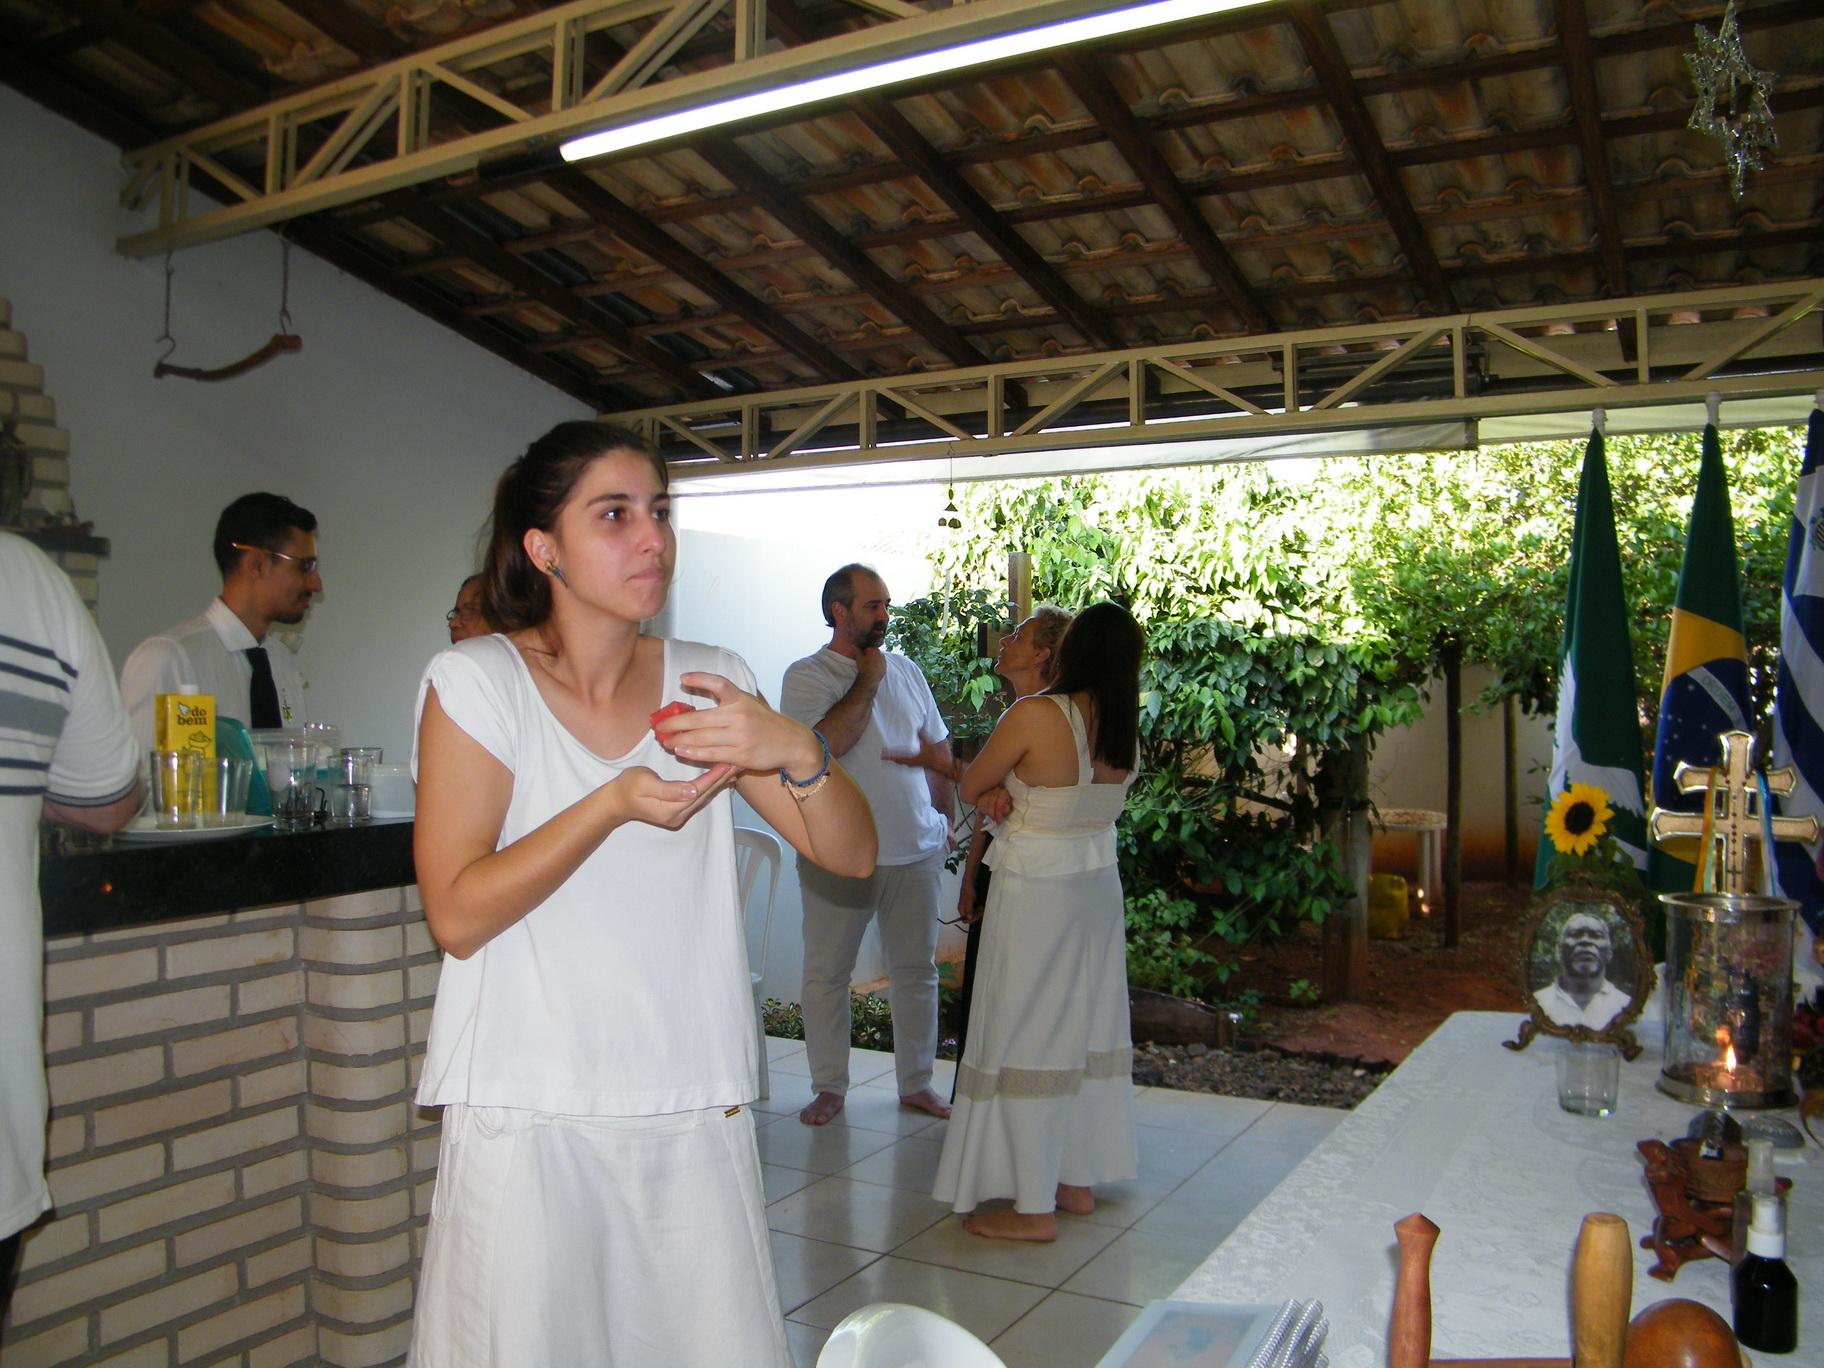 Confraternização_Hinário_Sois_Baliza_-_Germano_Guilherme_-_25-07-2015004.JPG